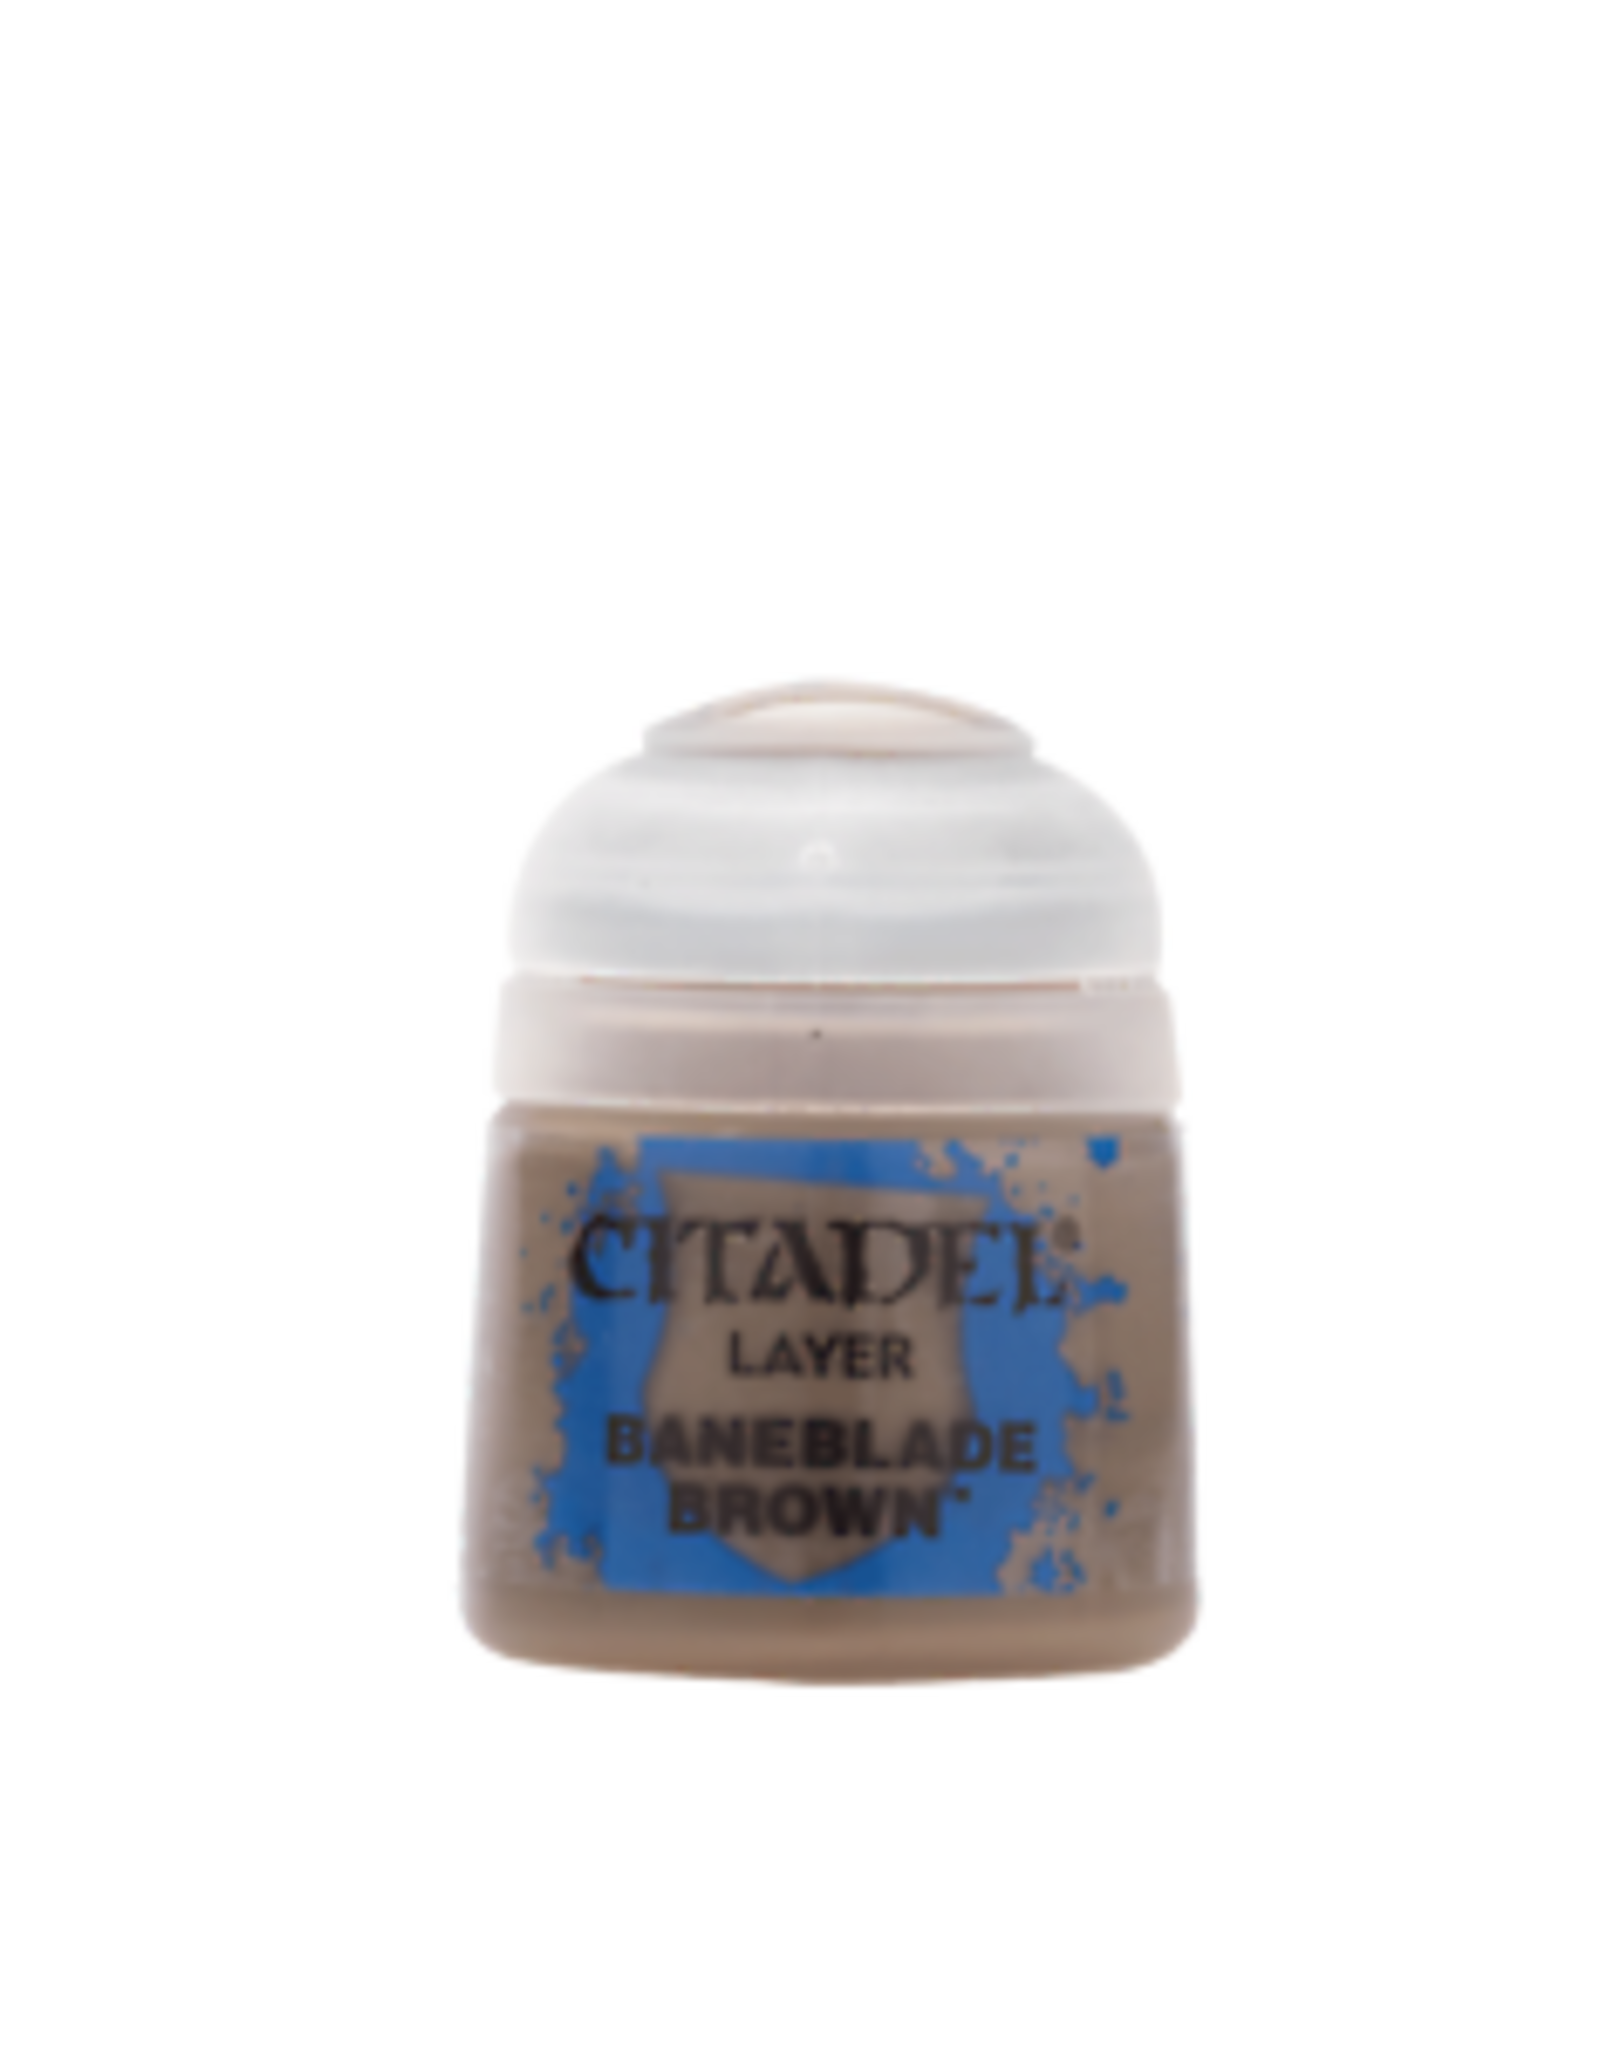 Citadel Paint Layer: Baneblade Brown